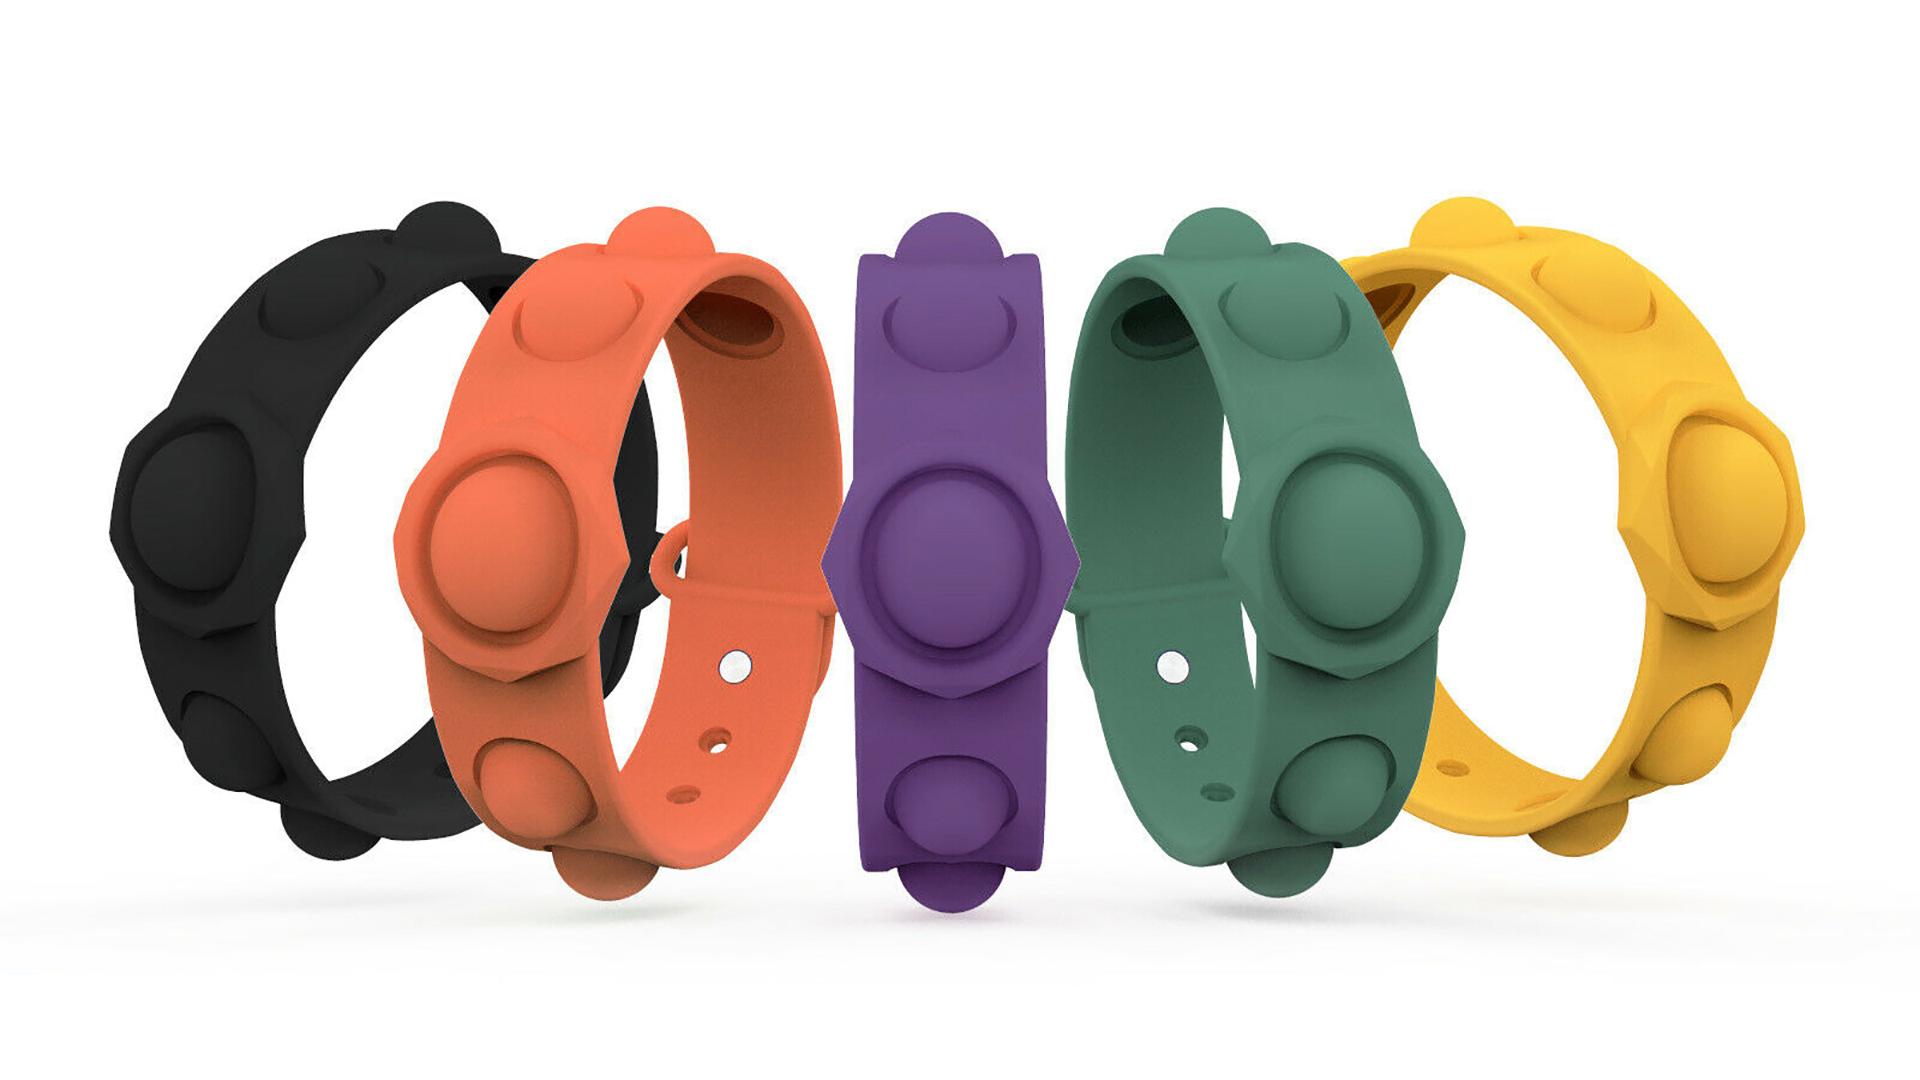 Sensory Toy Push POP Bubble Silicone Bracelet Soulagement Soulagement Silicone Bracelet DH-Silicone